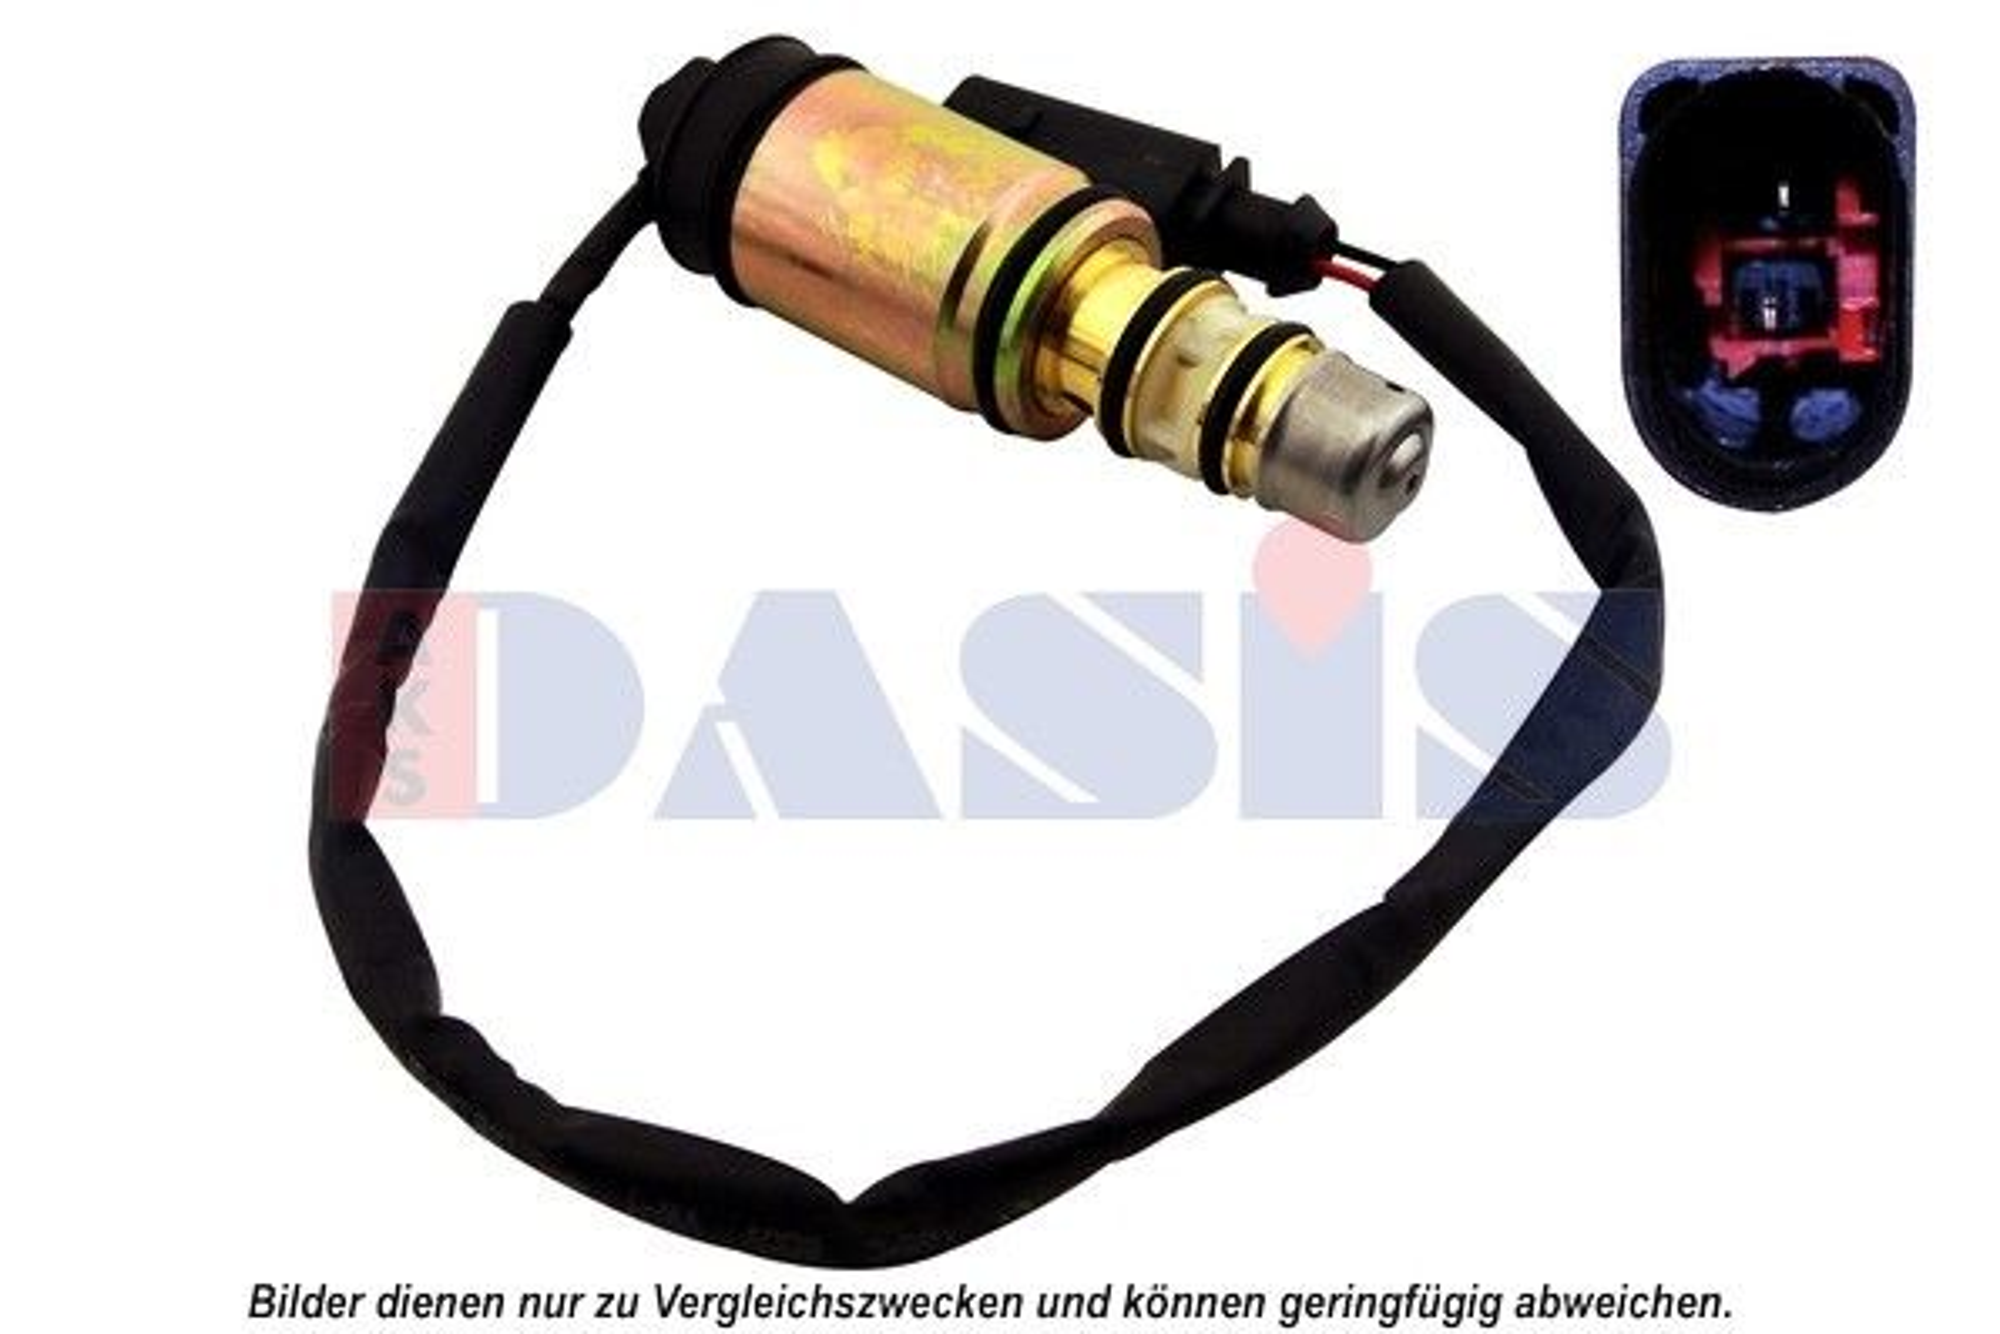 859004N AKS DASIS Regelventil, Kompressor 859004N günstig kaufen